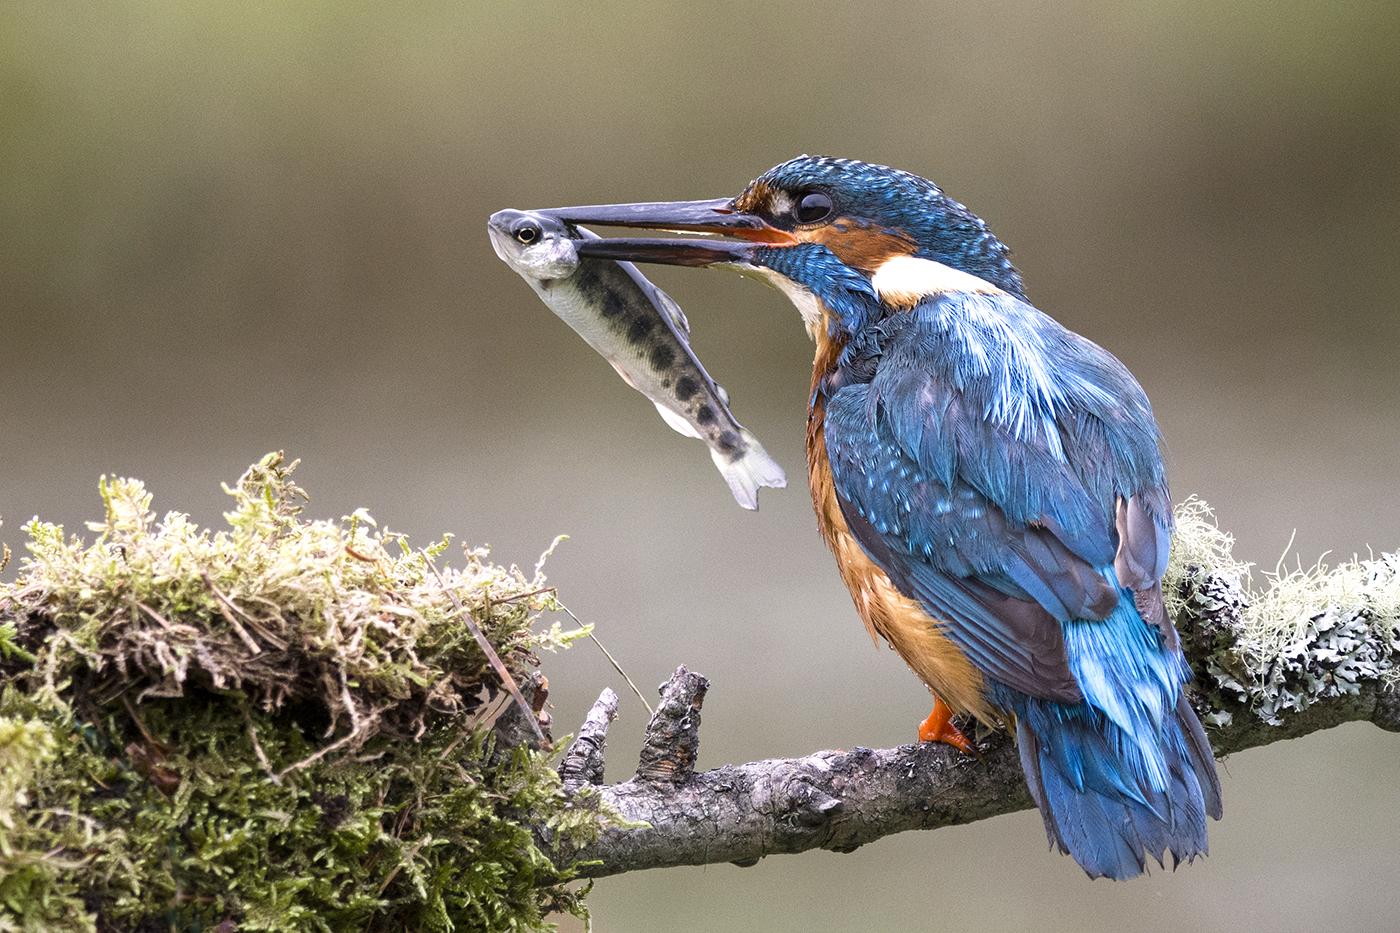 Kingfisher Feeding Young 2ndDigitals